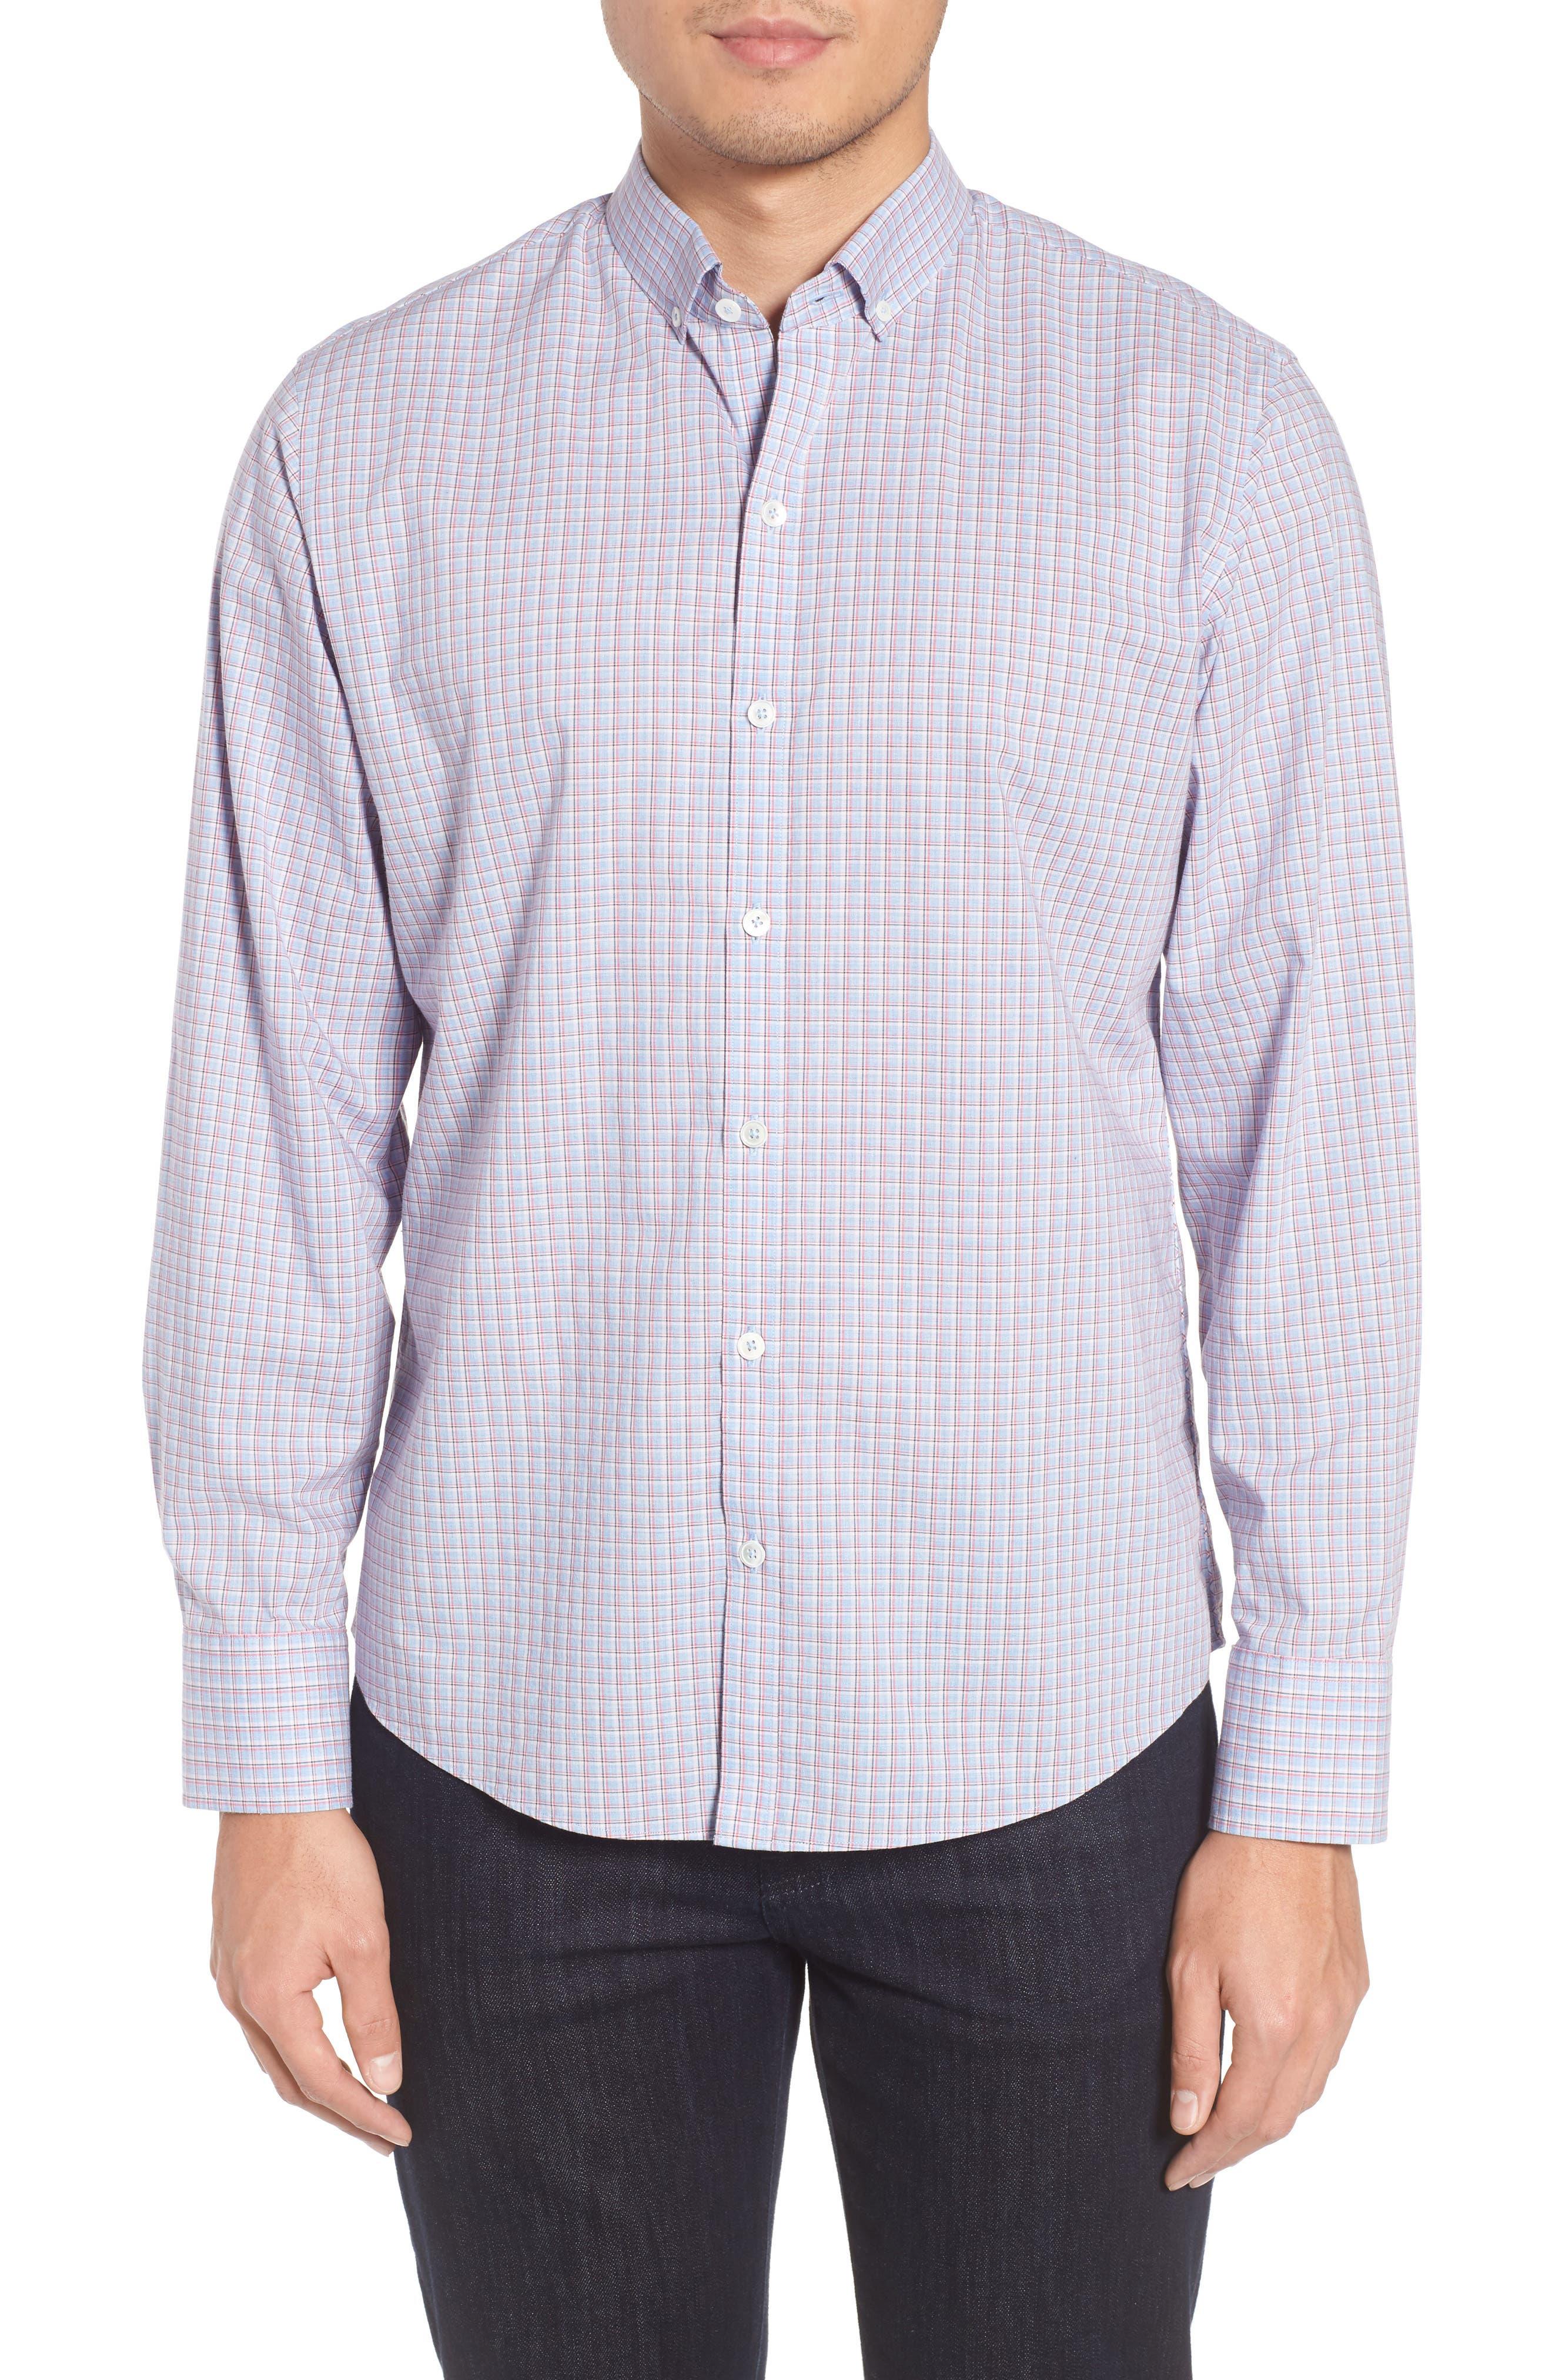 ZACHARY PRELL, Drozdov Regular Fit Plaid Sport Shirt, Main thumbnail 1, color, PINK